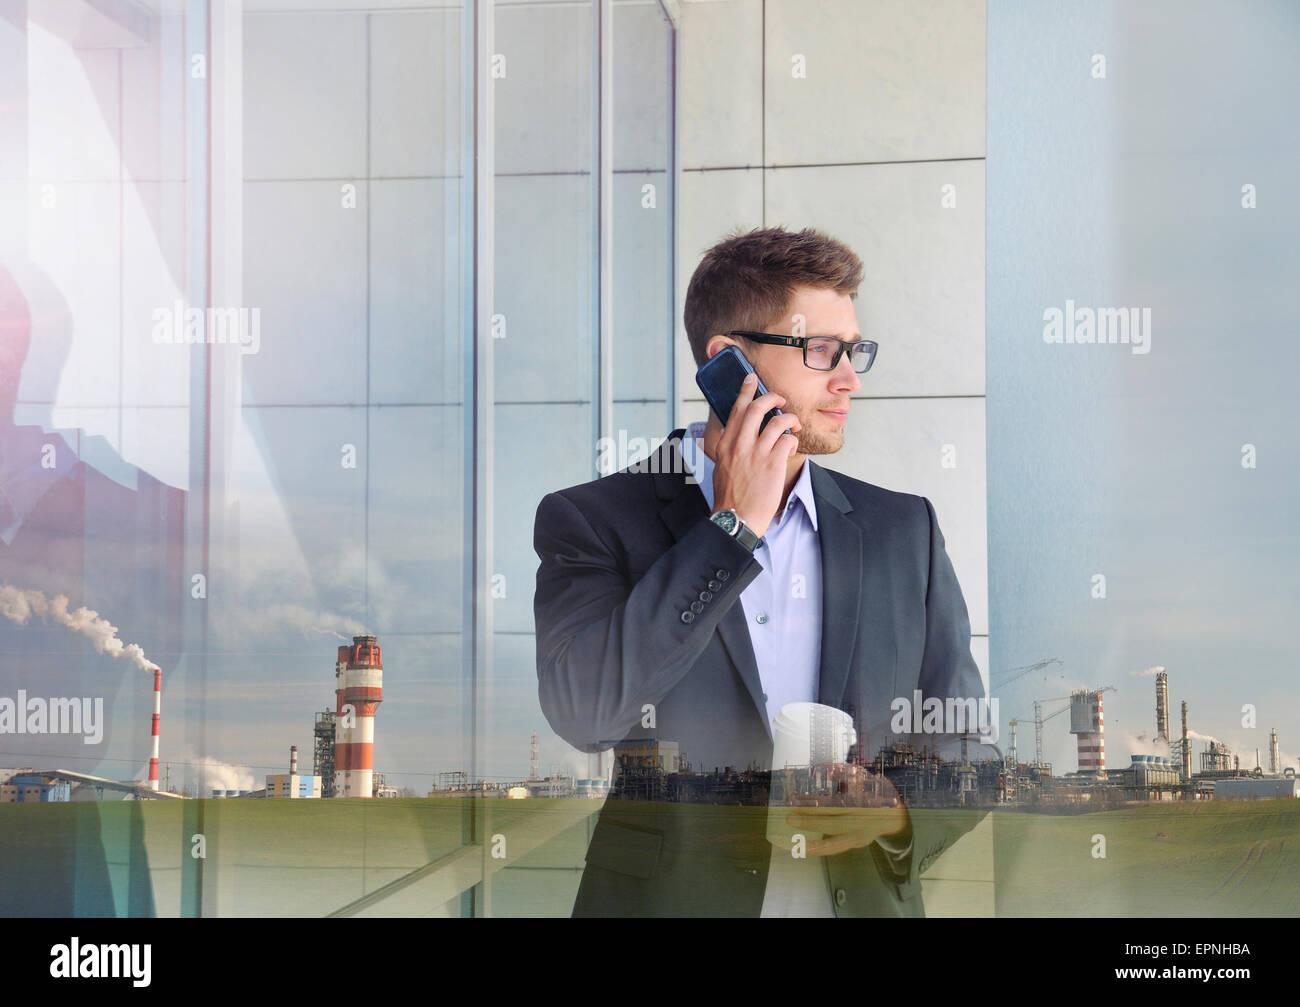 Doble exposición de empresario atractivo urbano e industrial con dispositivo de teléfono de fondo de construcción Imagen De Stock